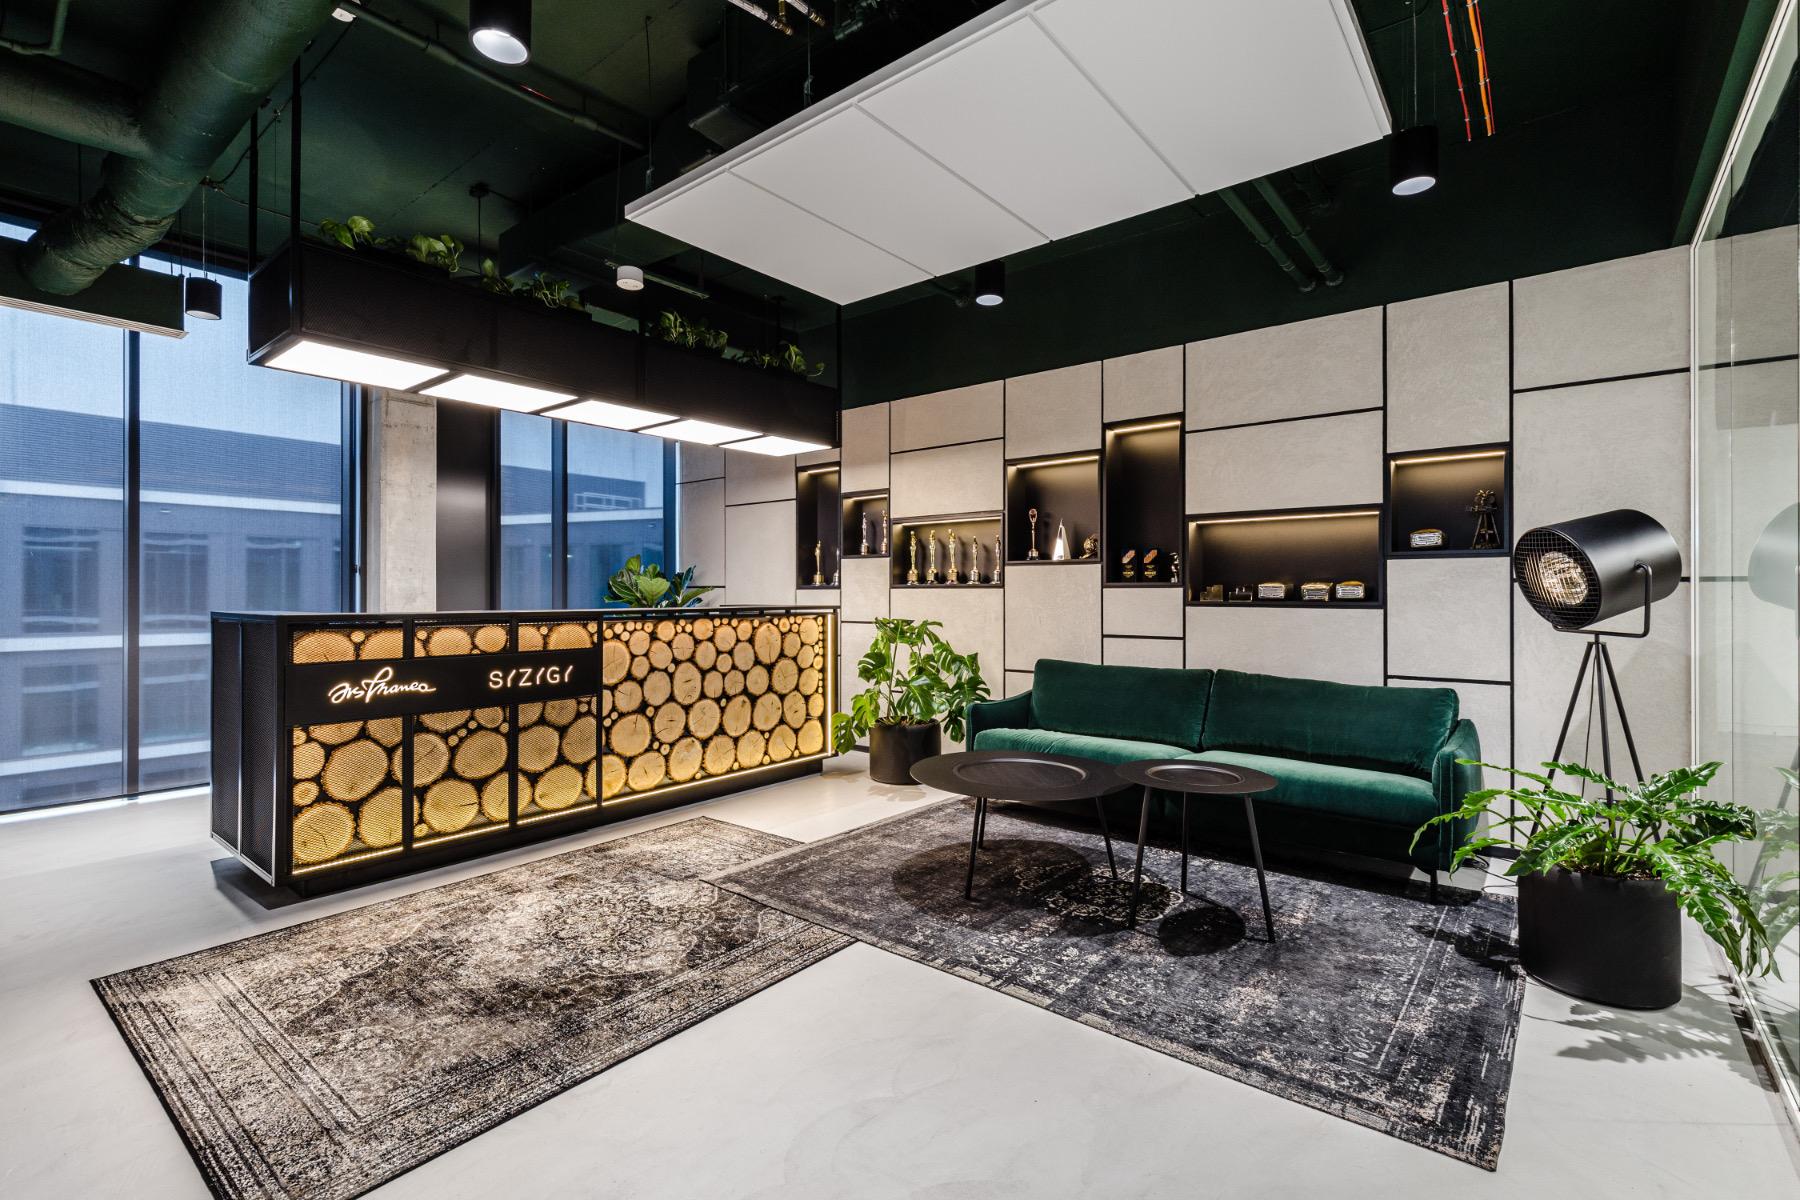 Inside Syzygy &Ars Thanea's New Warsaw HQ